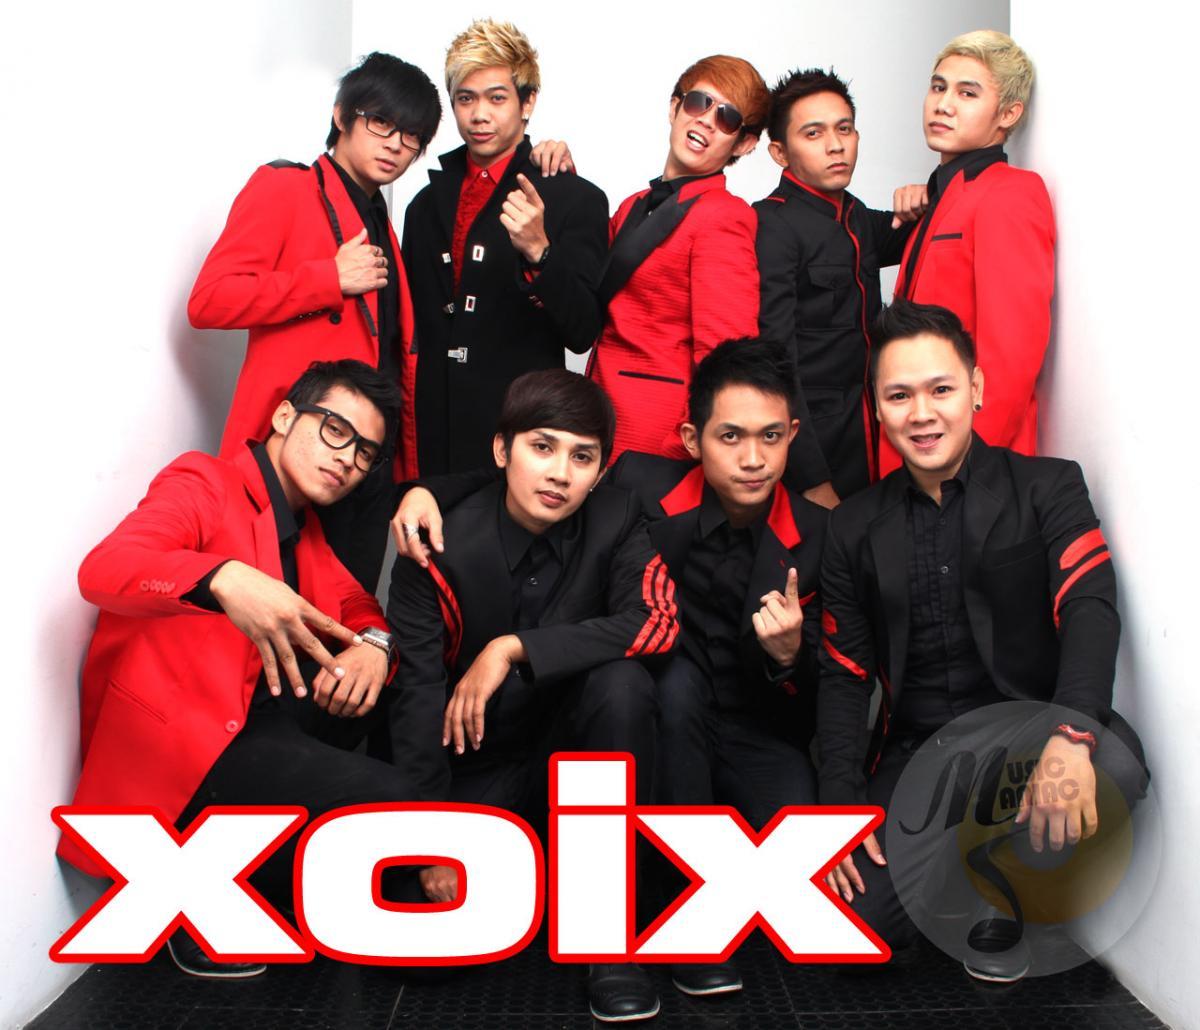 Download Lagu Xo-ix Wow Gratis Lirik